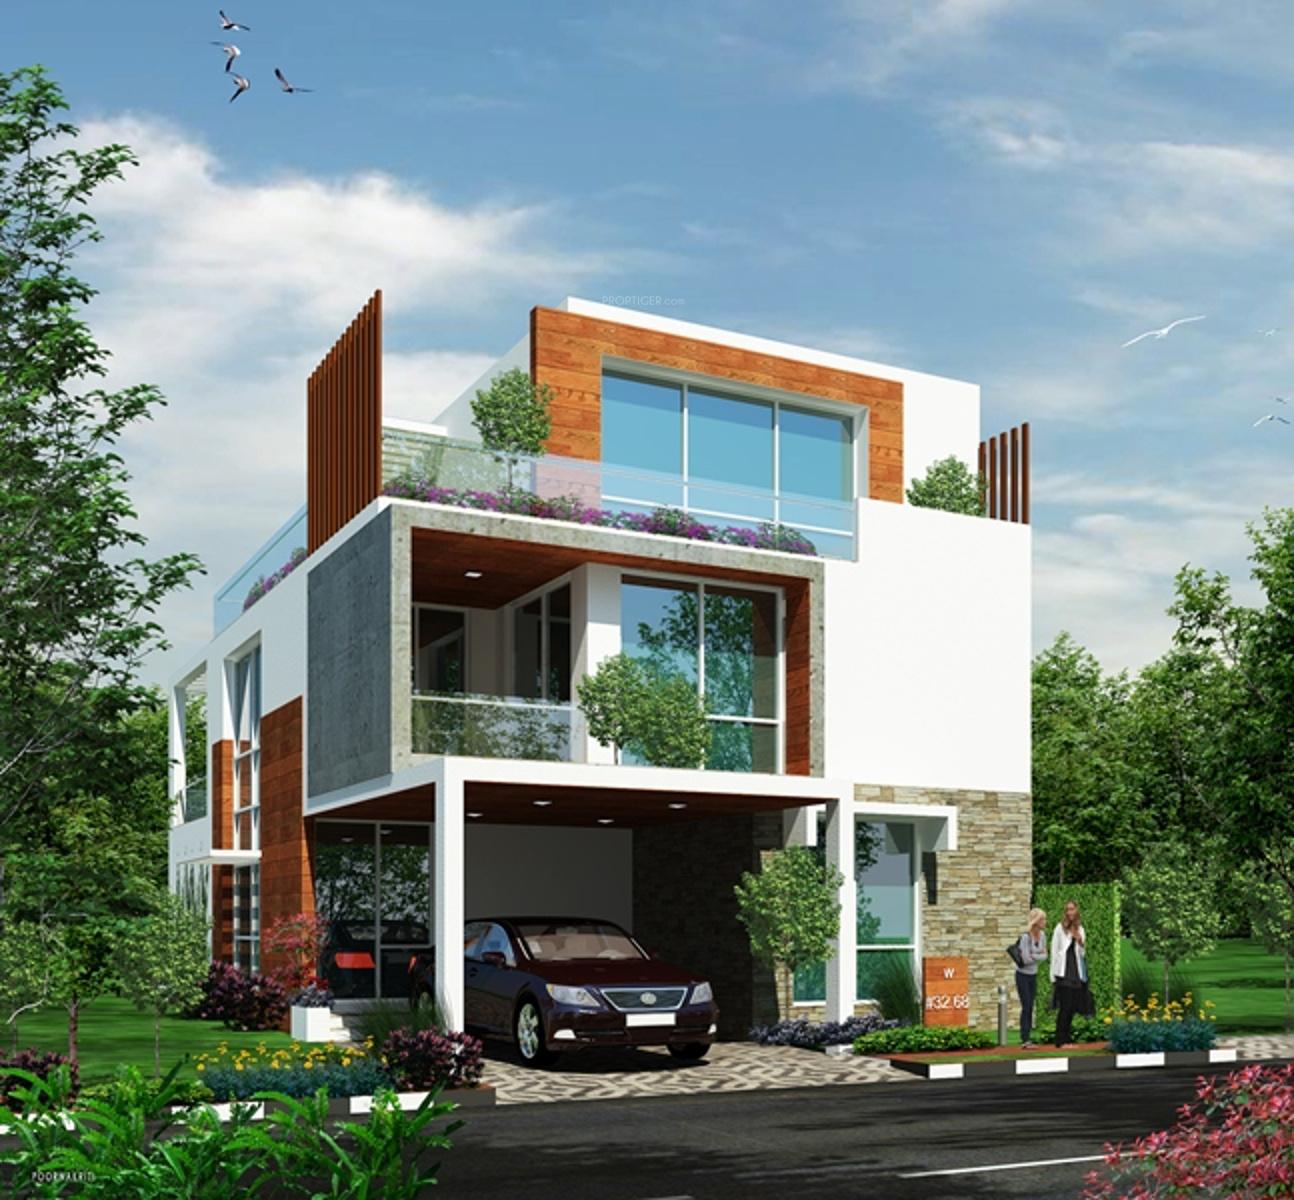 Kitchen Garden Bangalore: VRR Golden Enclave In Electronic City Phase 1, Bangalore